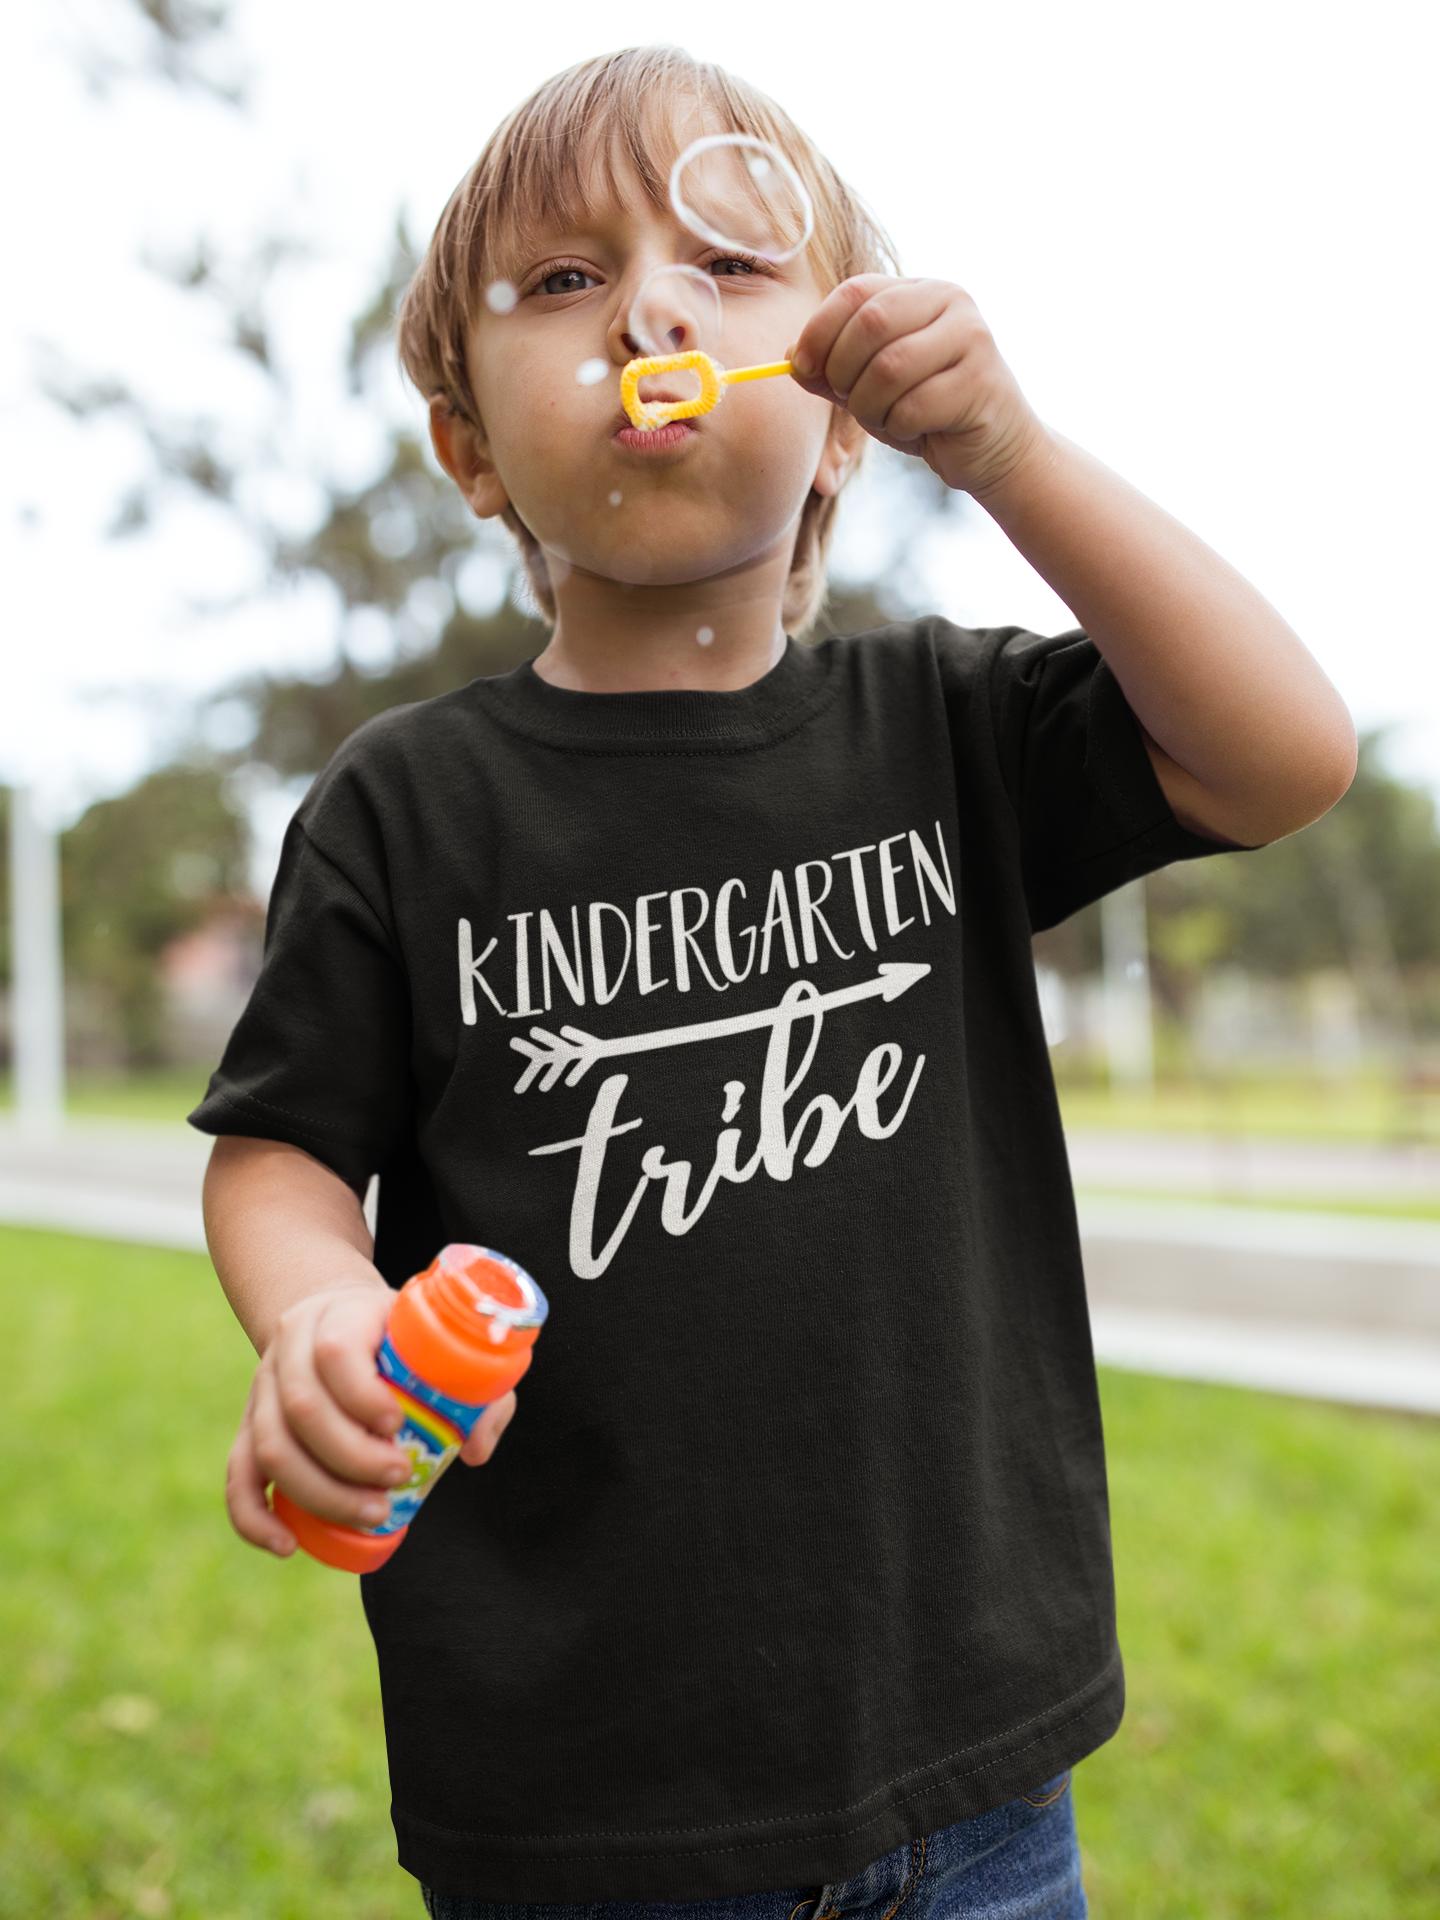 cba9fd216c95 Pin by Bump and Beyond Designs - Kids Fashion Clothing on Boy ...